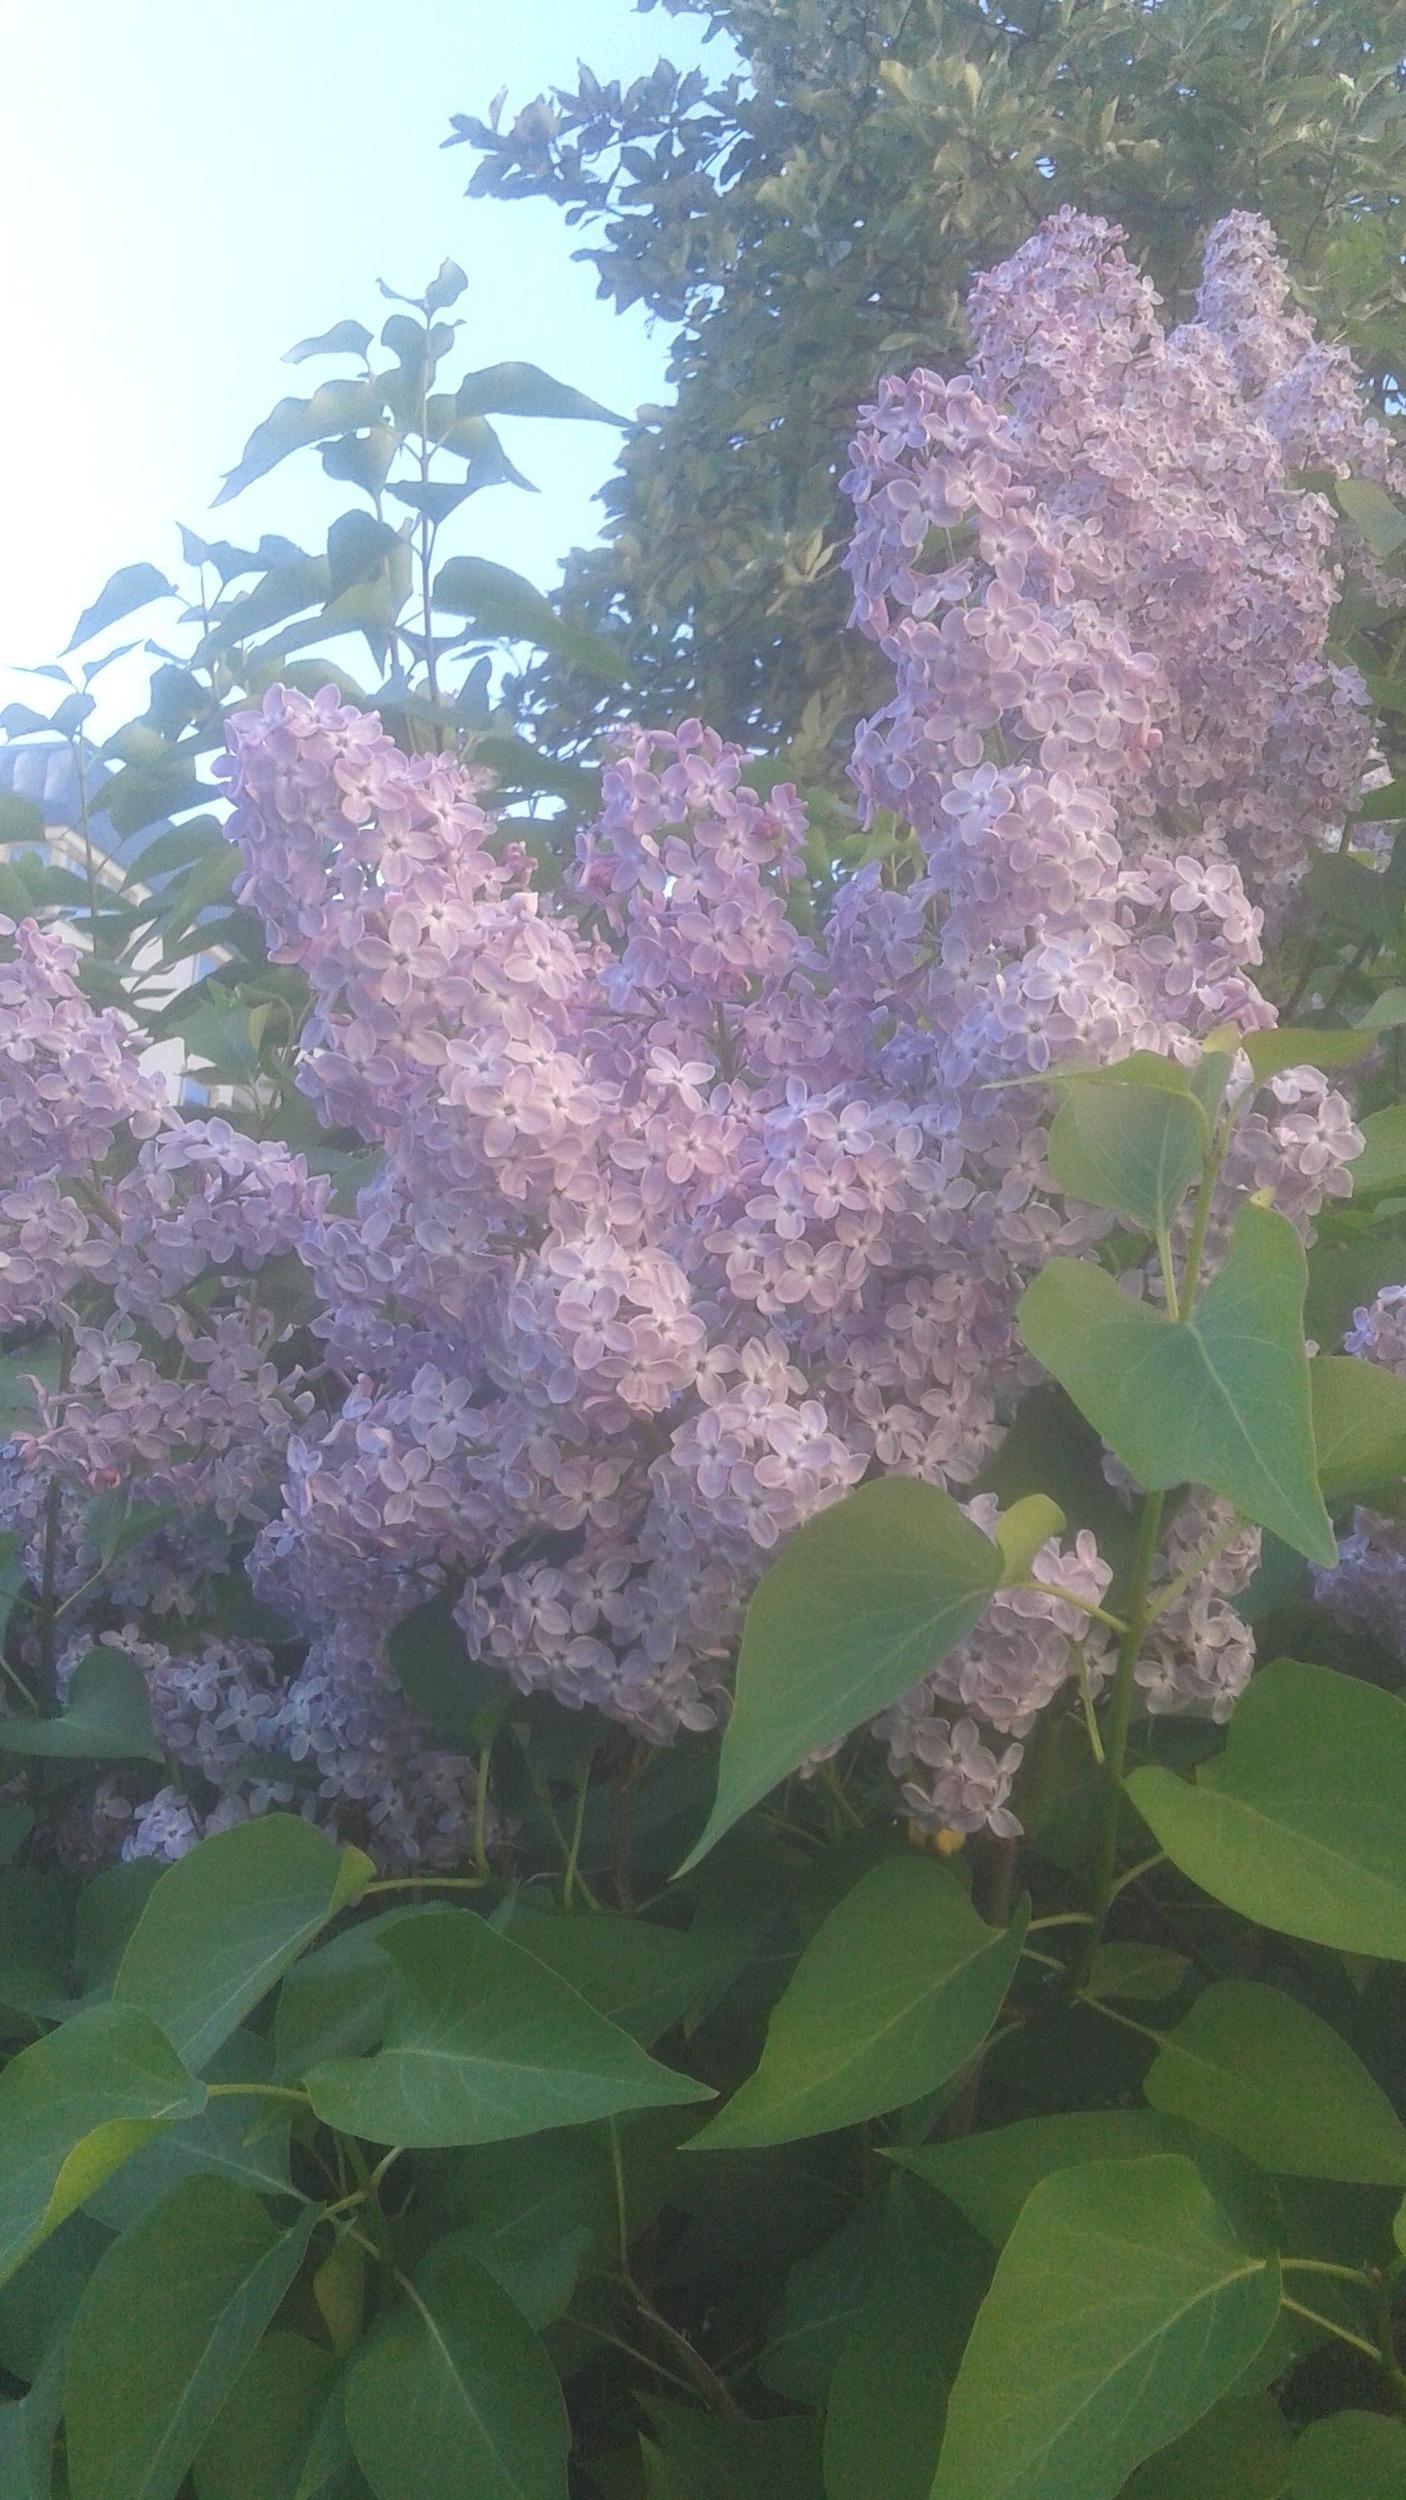 Syrenbuske+lila.jpg